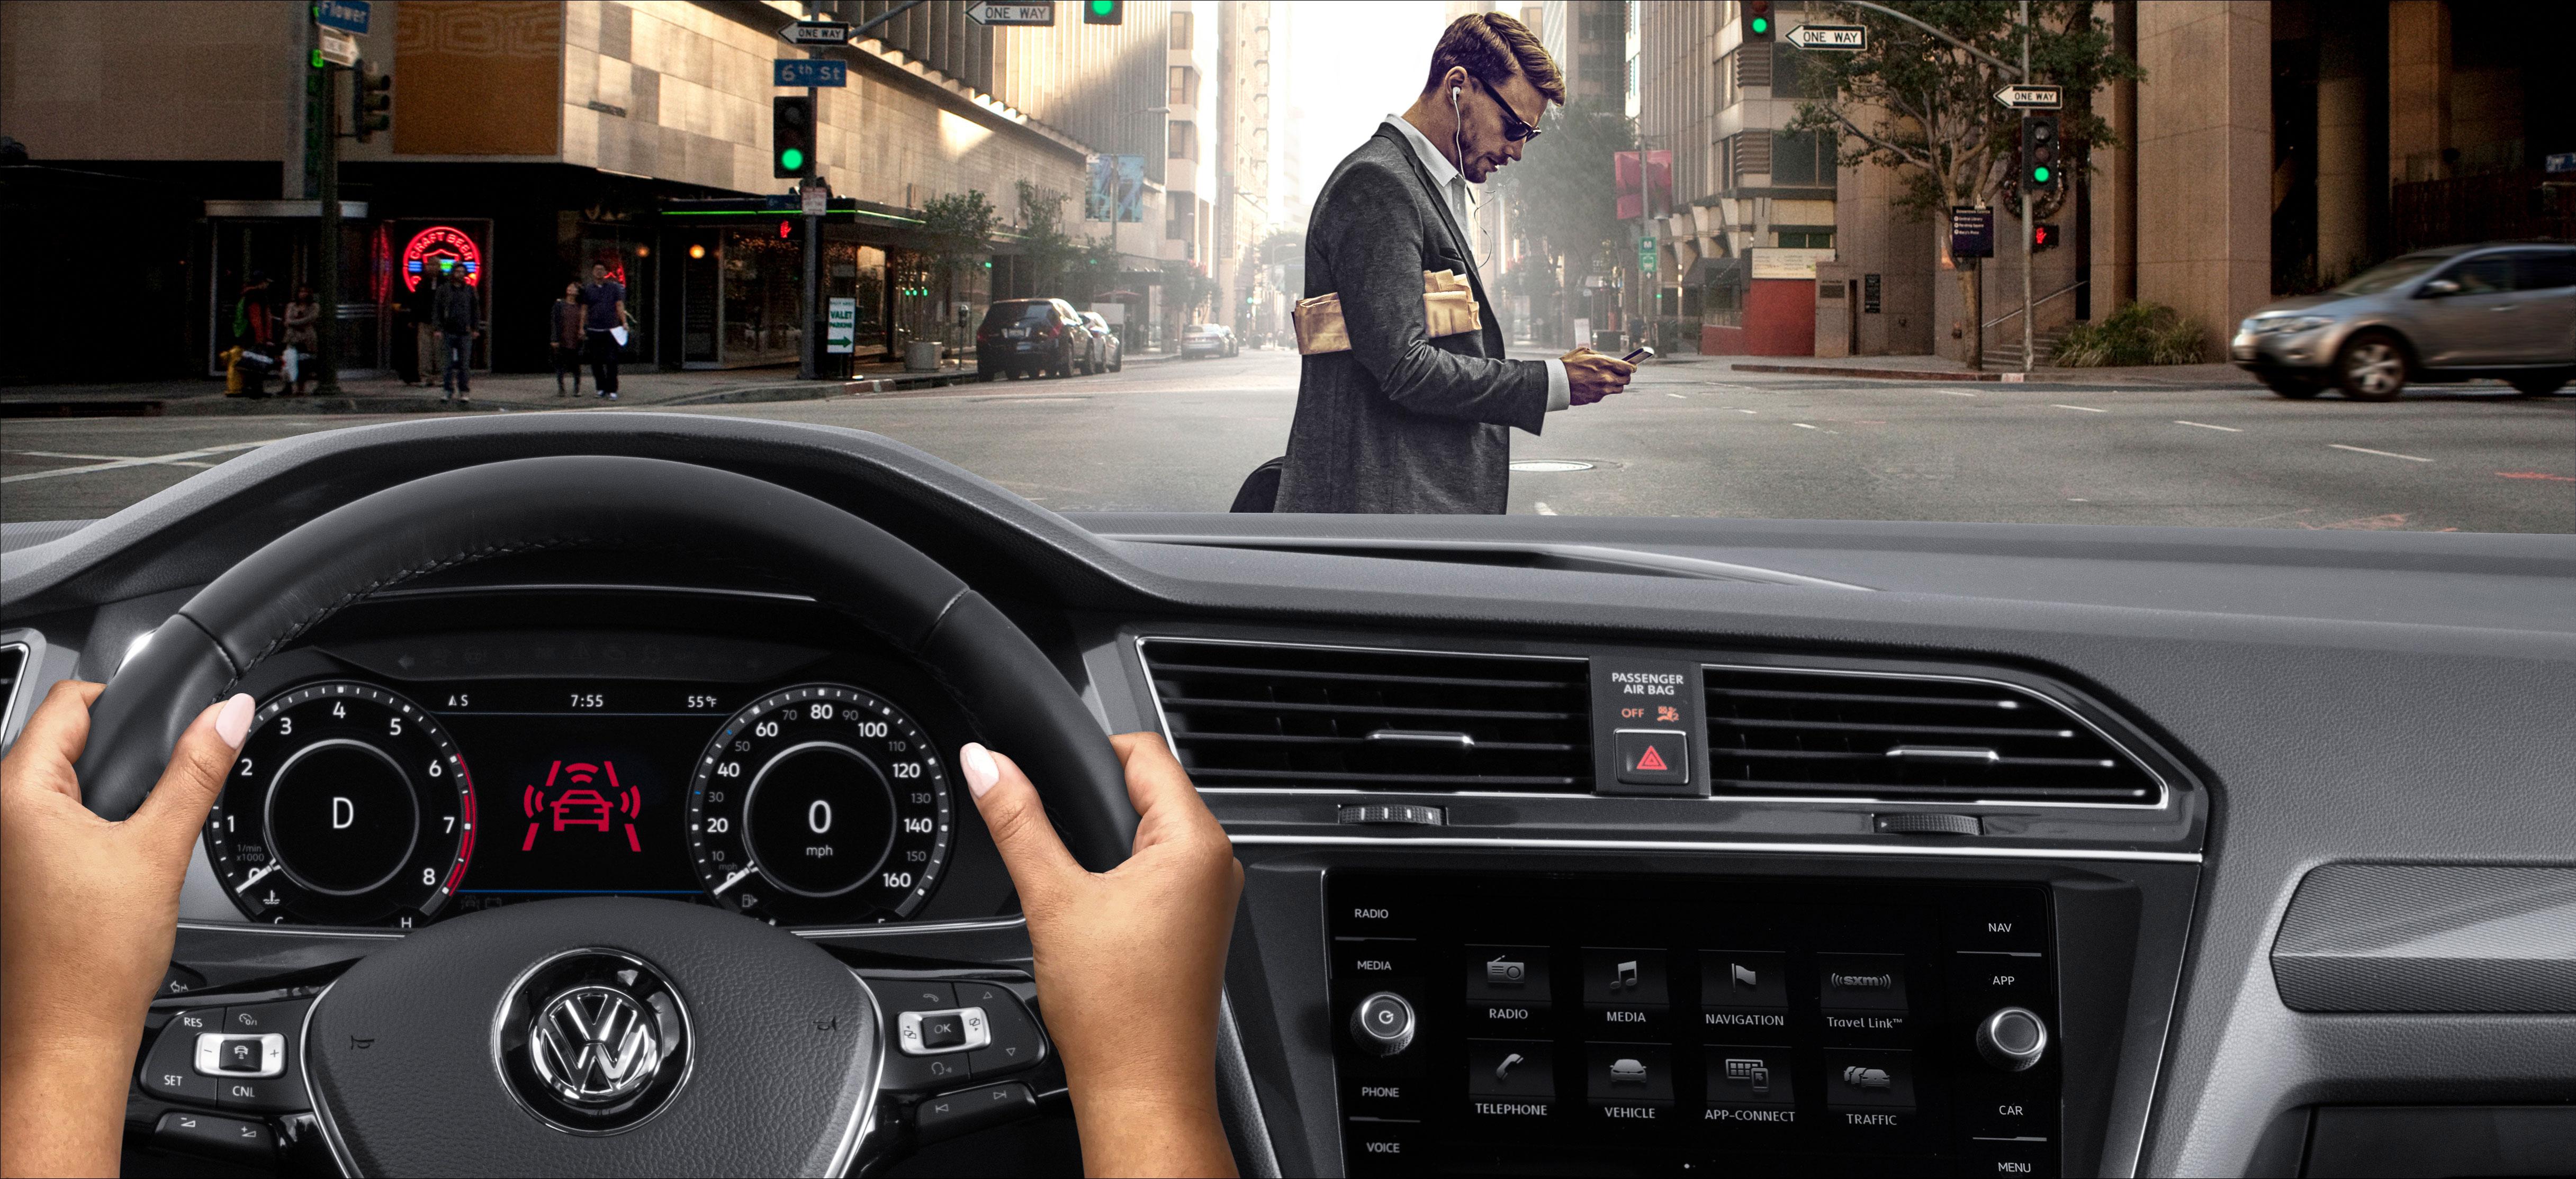 Volkswagen describes autobraking/pedestrian monitoring radar